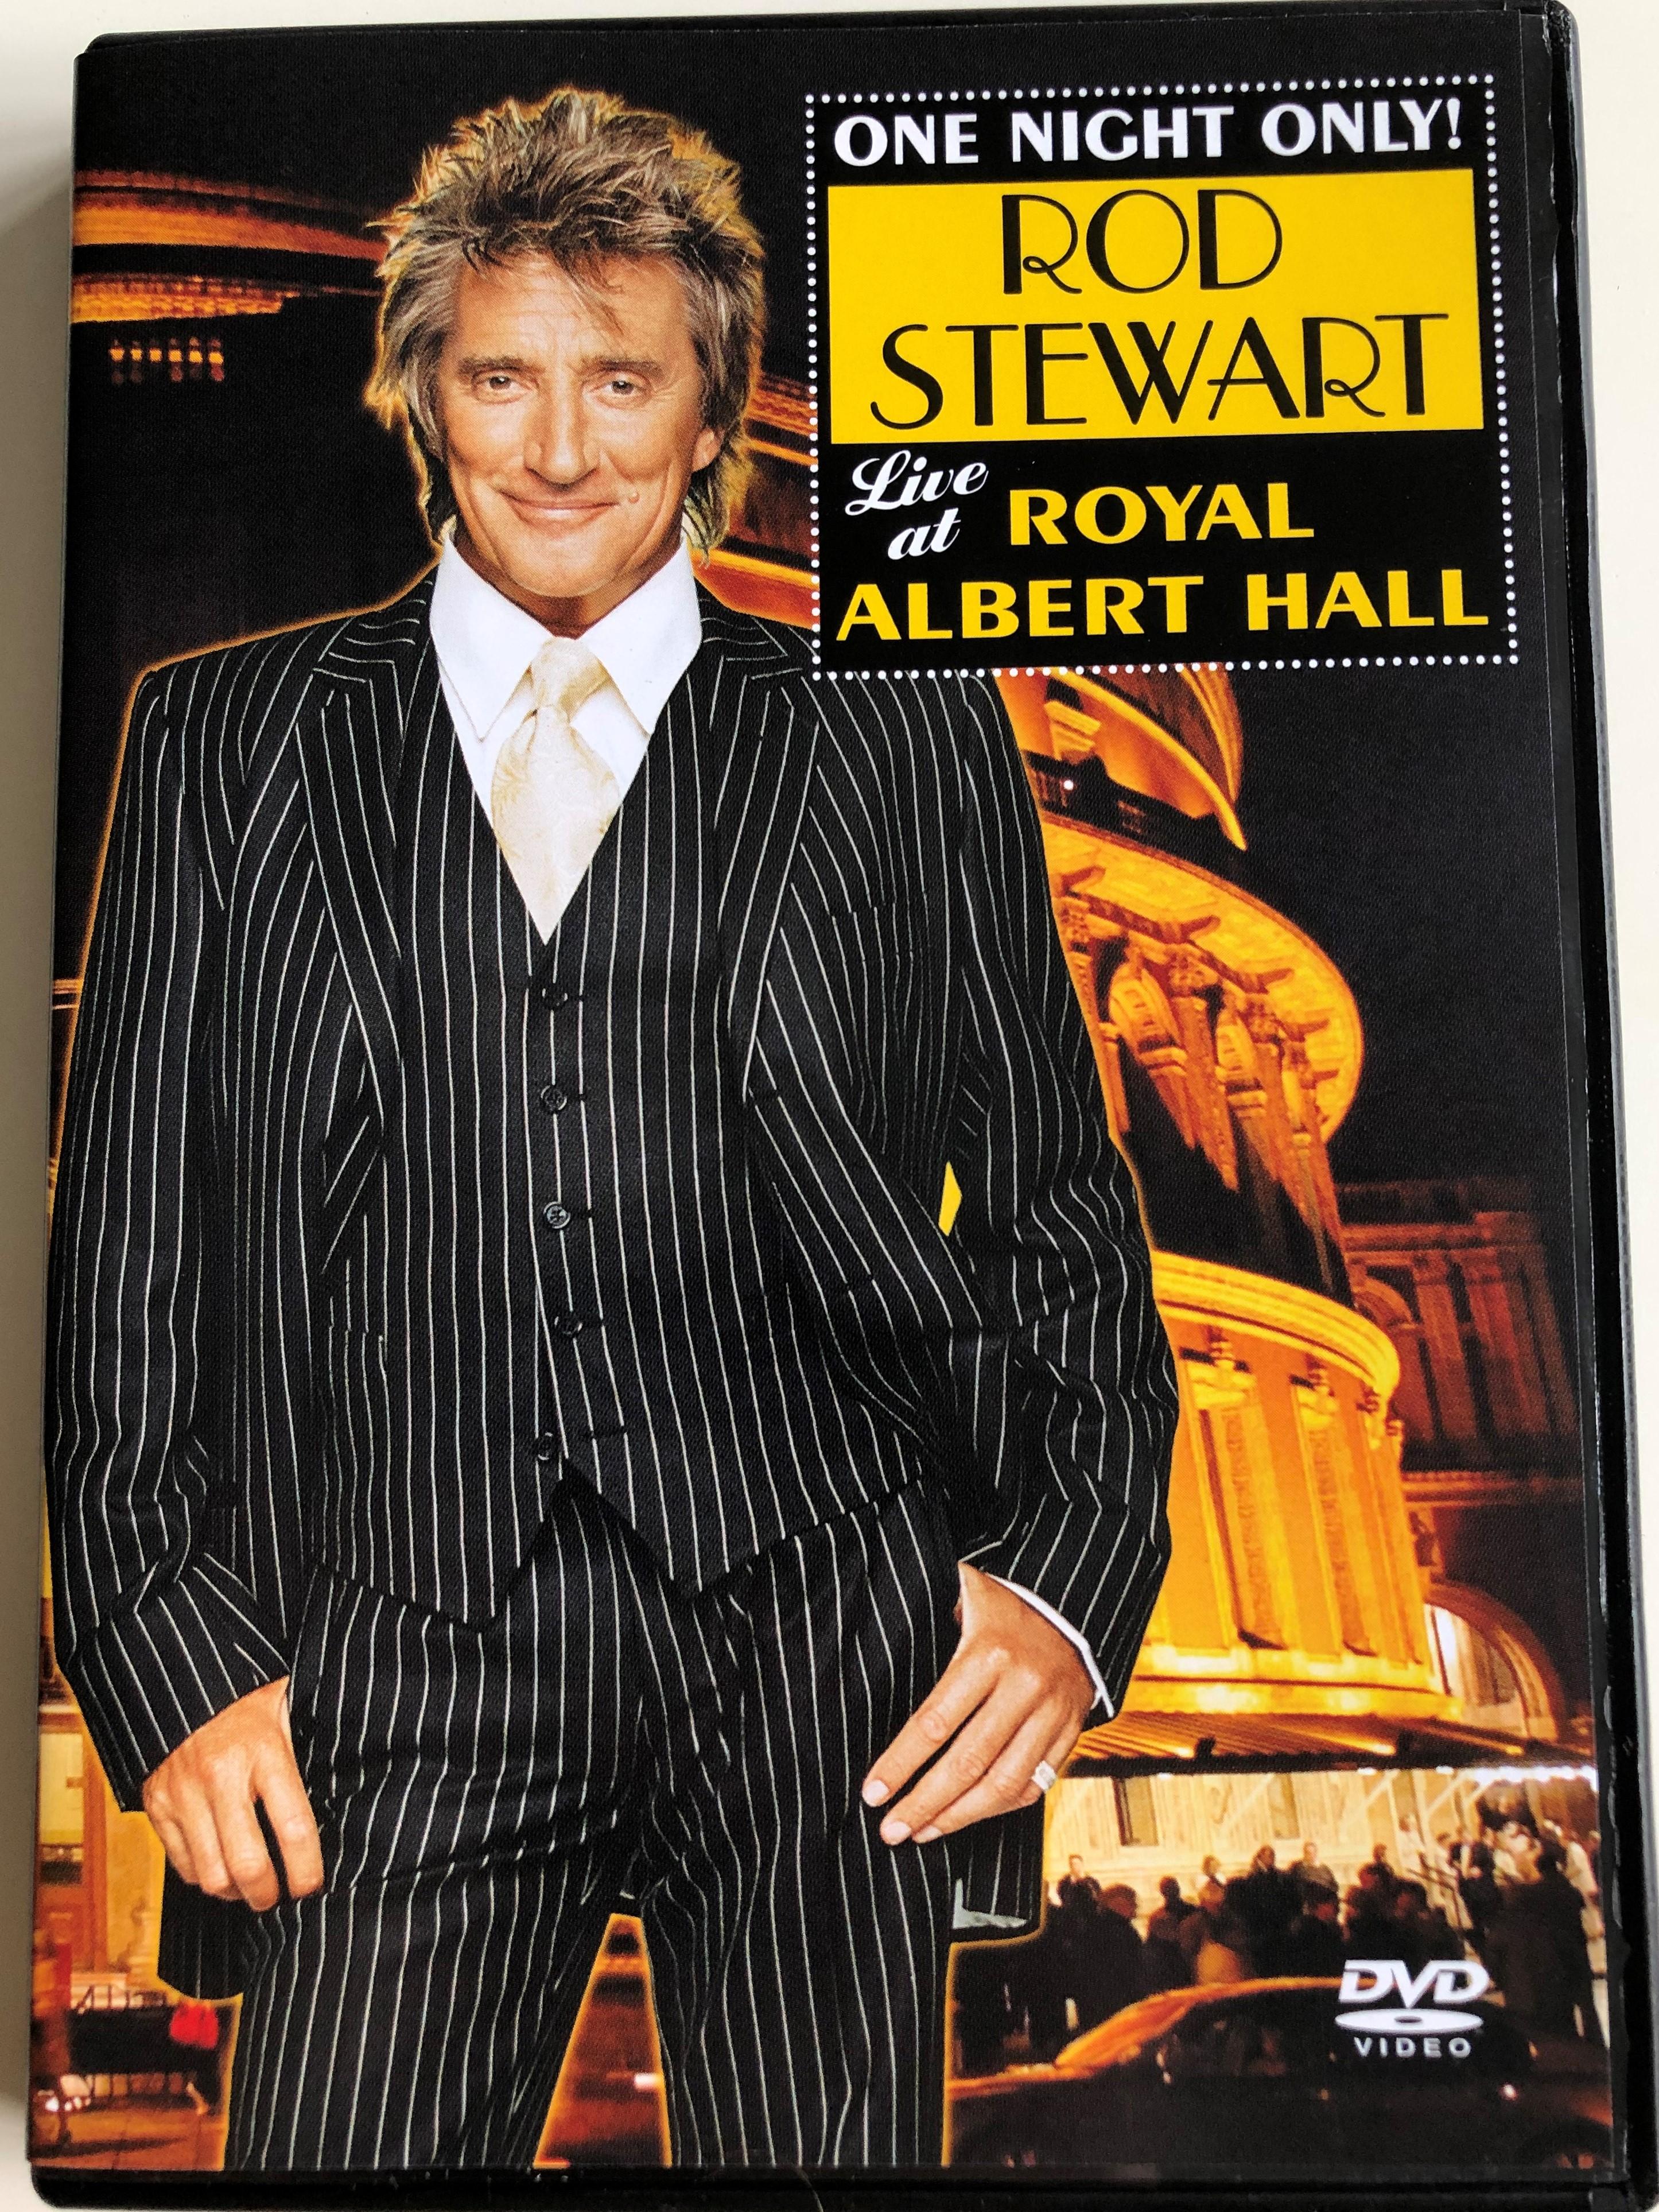 rod-stewart-live-at-royal-albert-hall-dvd-2004-one-night-only-bmg-bbc-1-.jpg